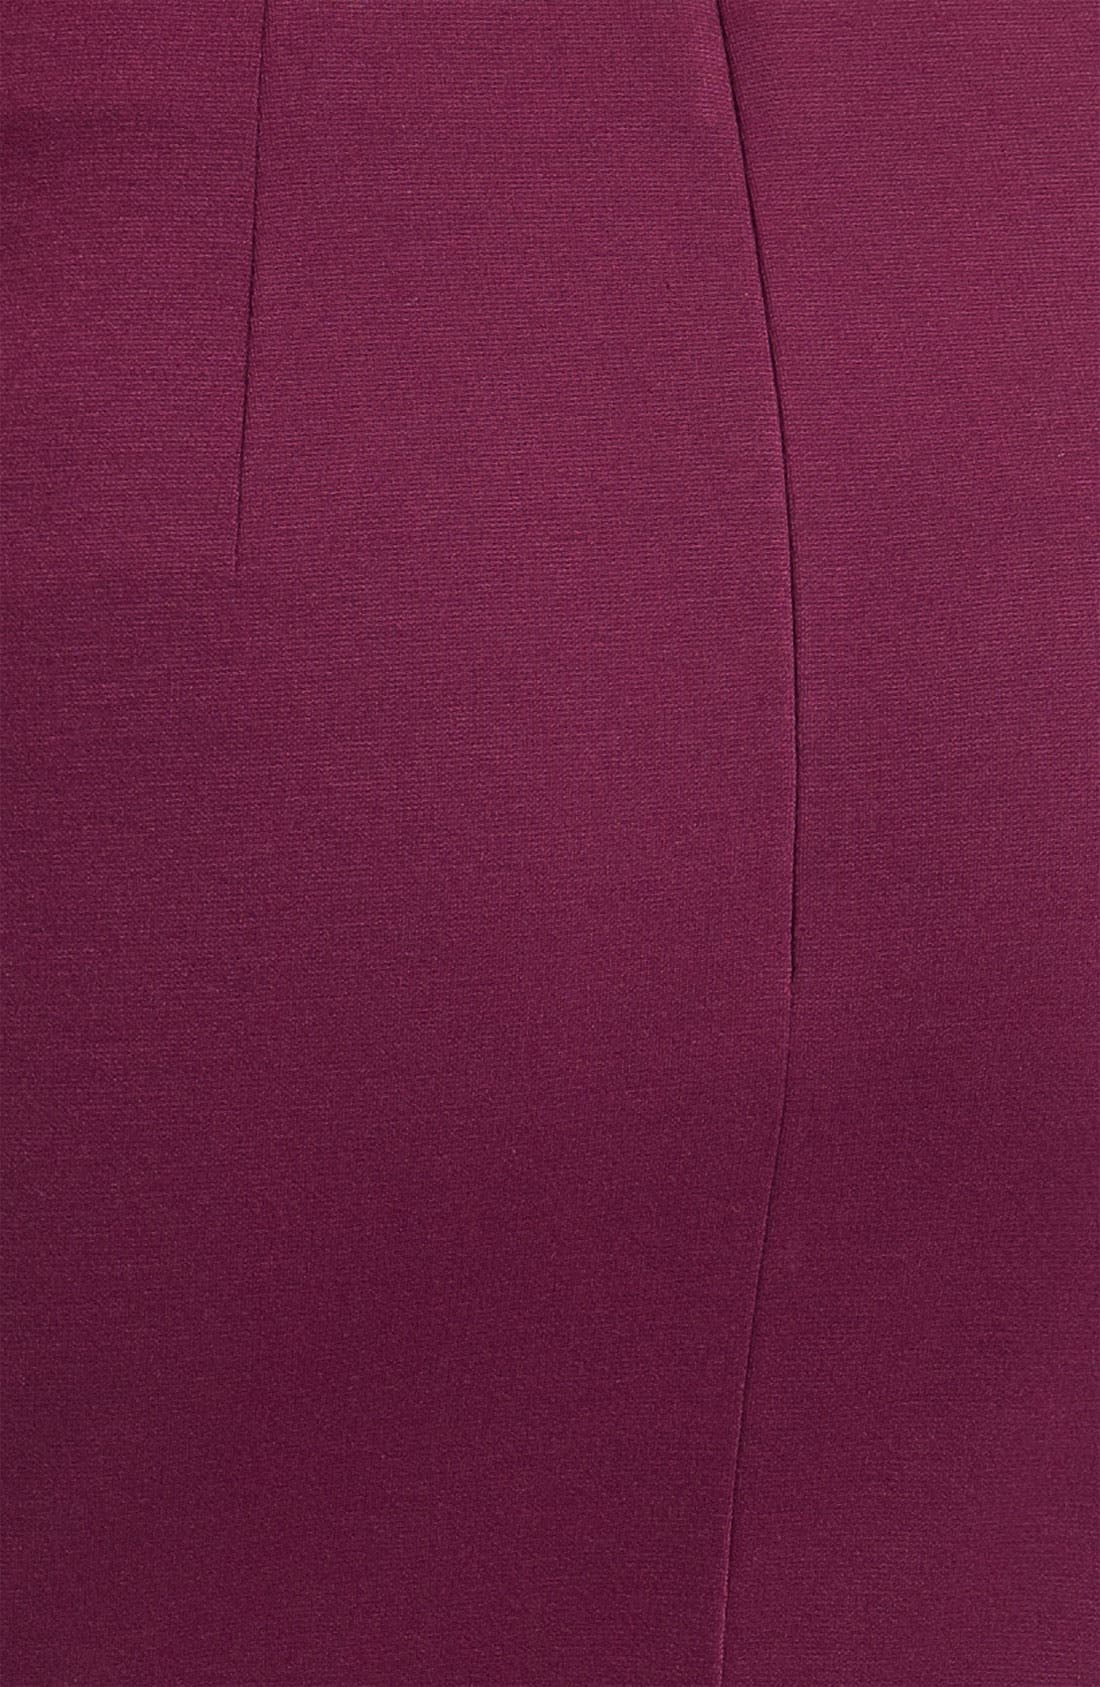 Belted Ponte Skirt,                             Alternate thumbnail 24, color,